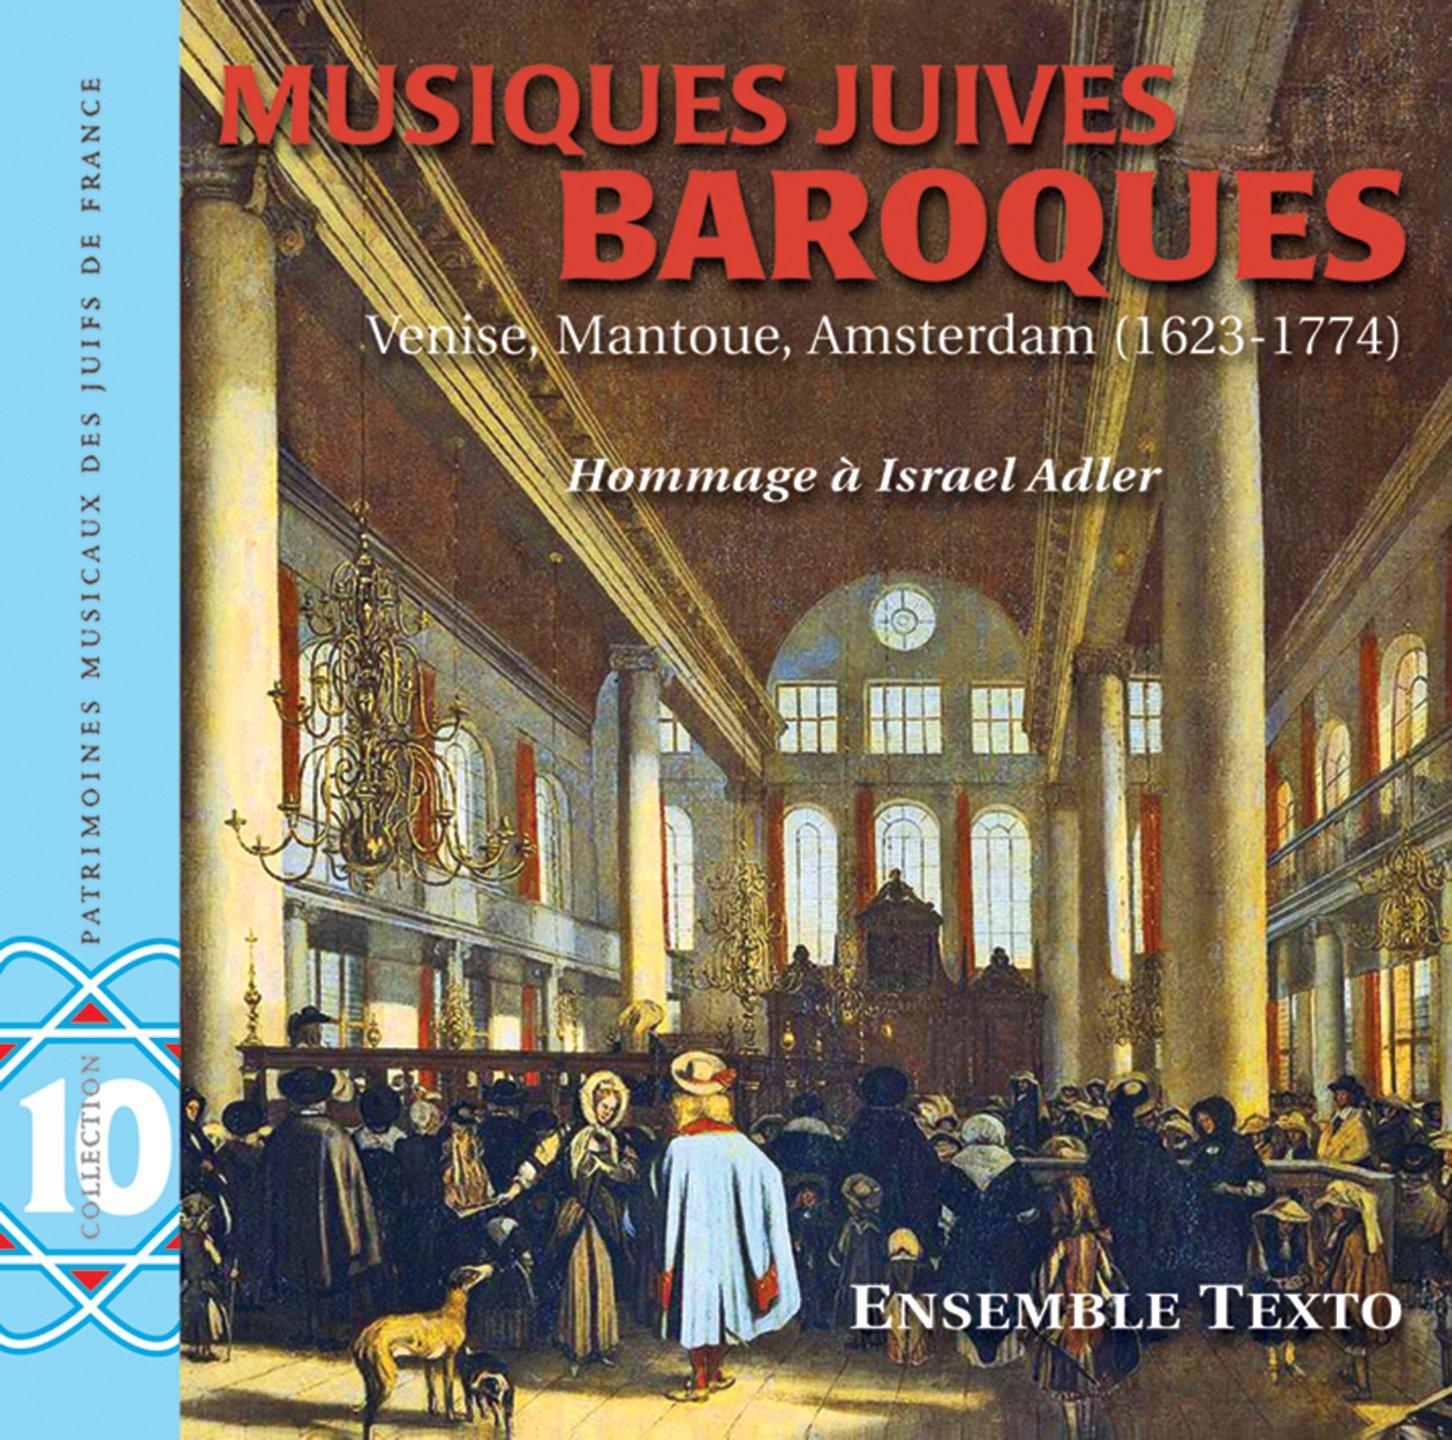 Jewish Baroque Music: Venice by Buda Musique